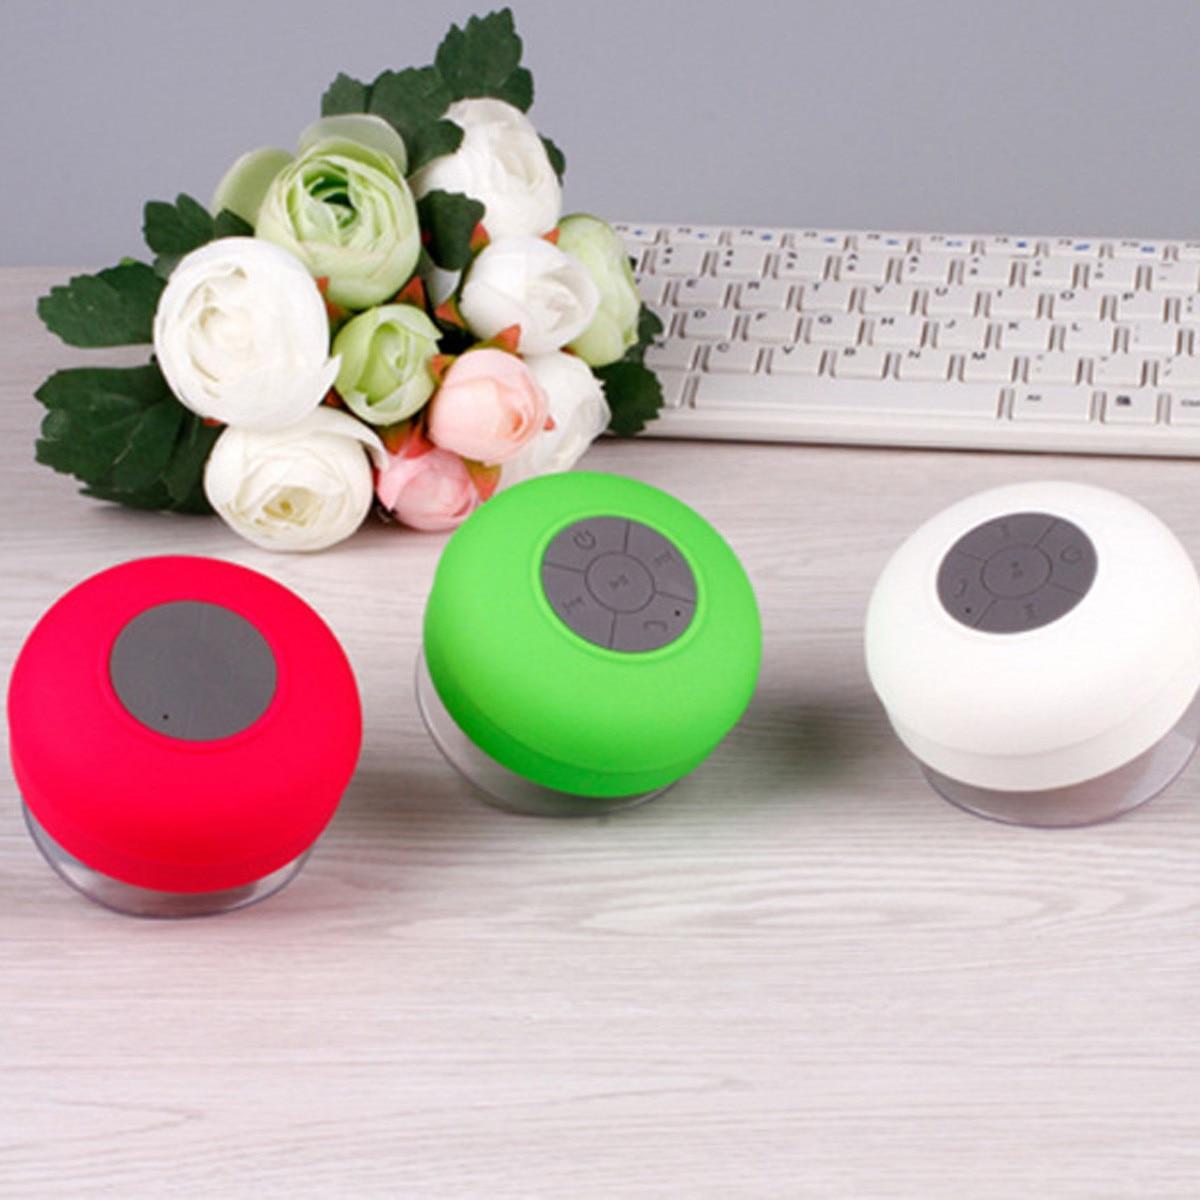 Mini altavoz portátil impermeable Bluetooth para la ducha/Altavoz del coche con reproductor estéreo de música MP3